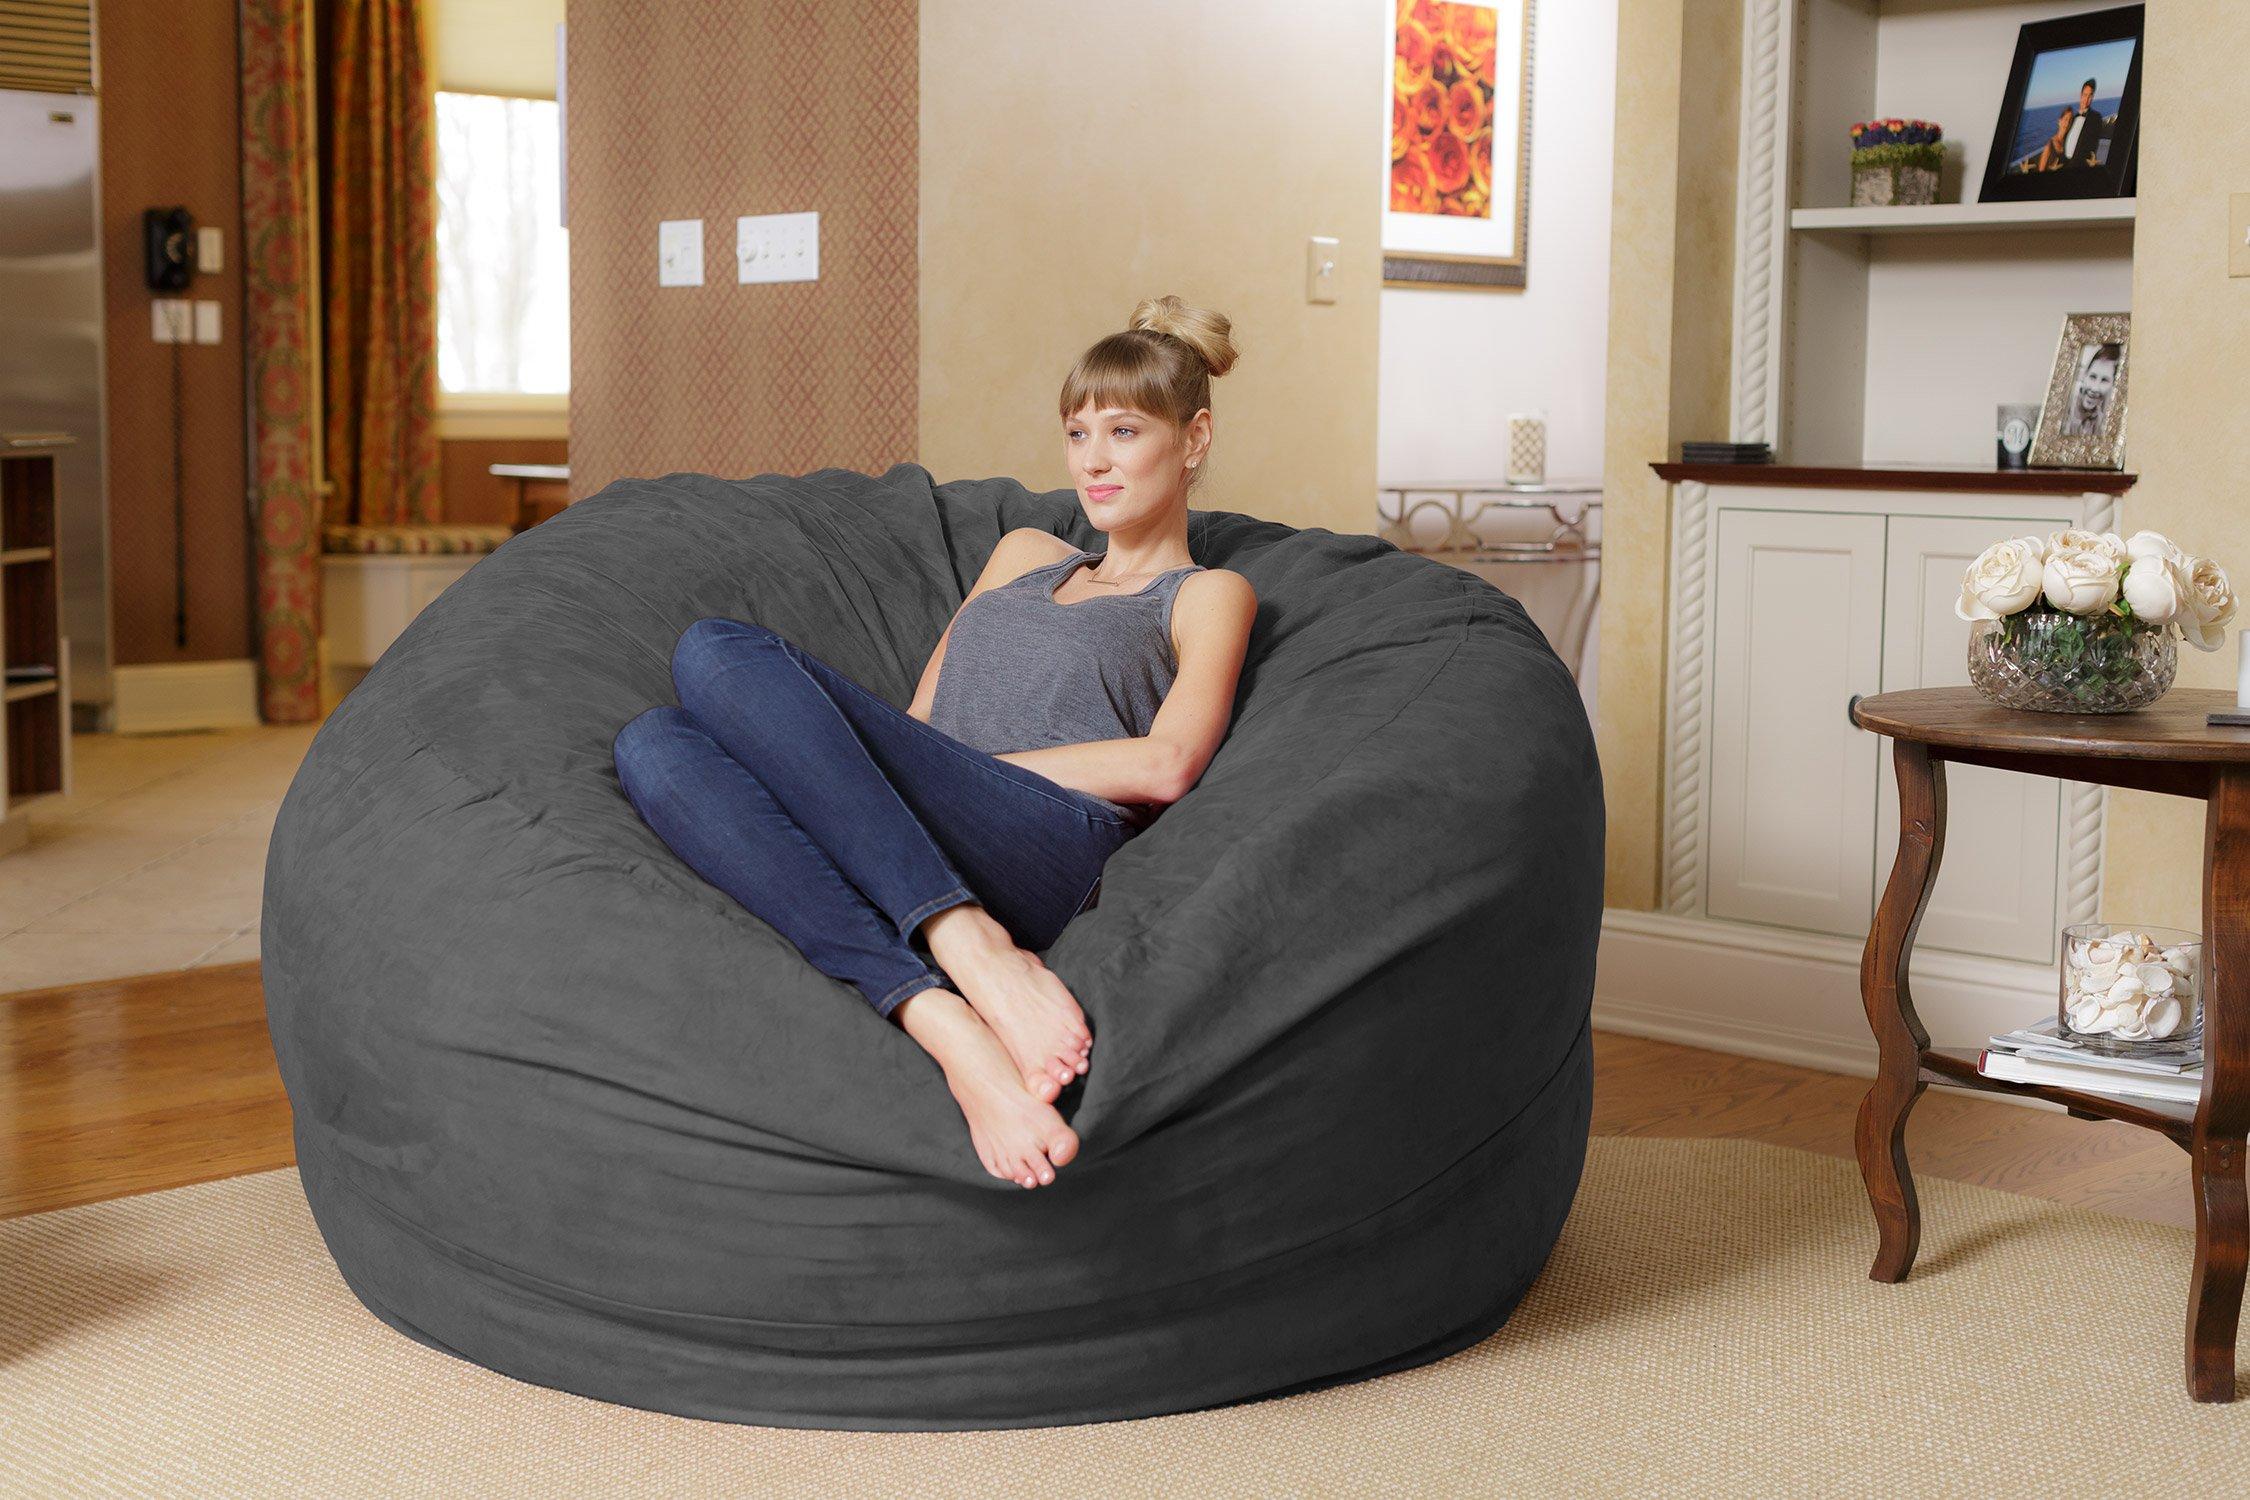 Bean Bag Chair Lounger Giant 6' Memory Foam Big Sofa Soft ...